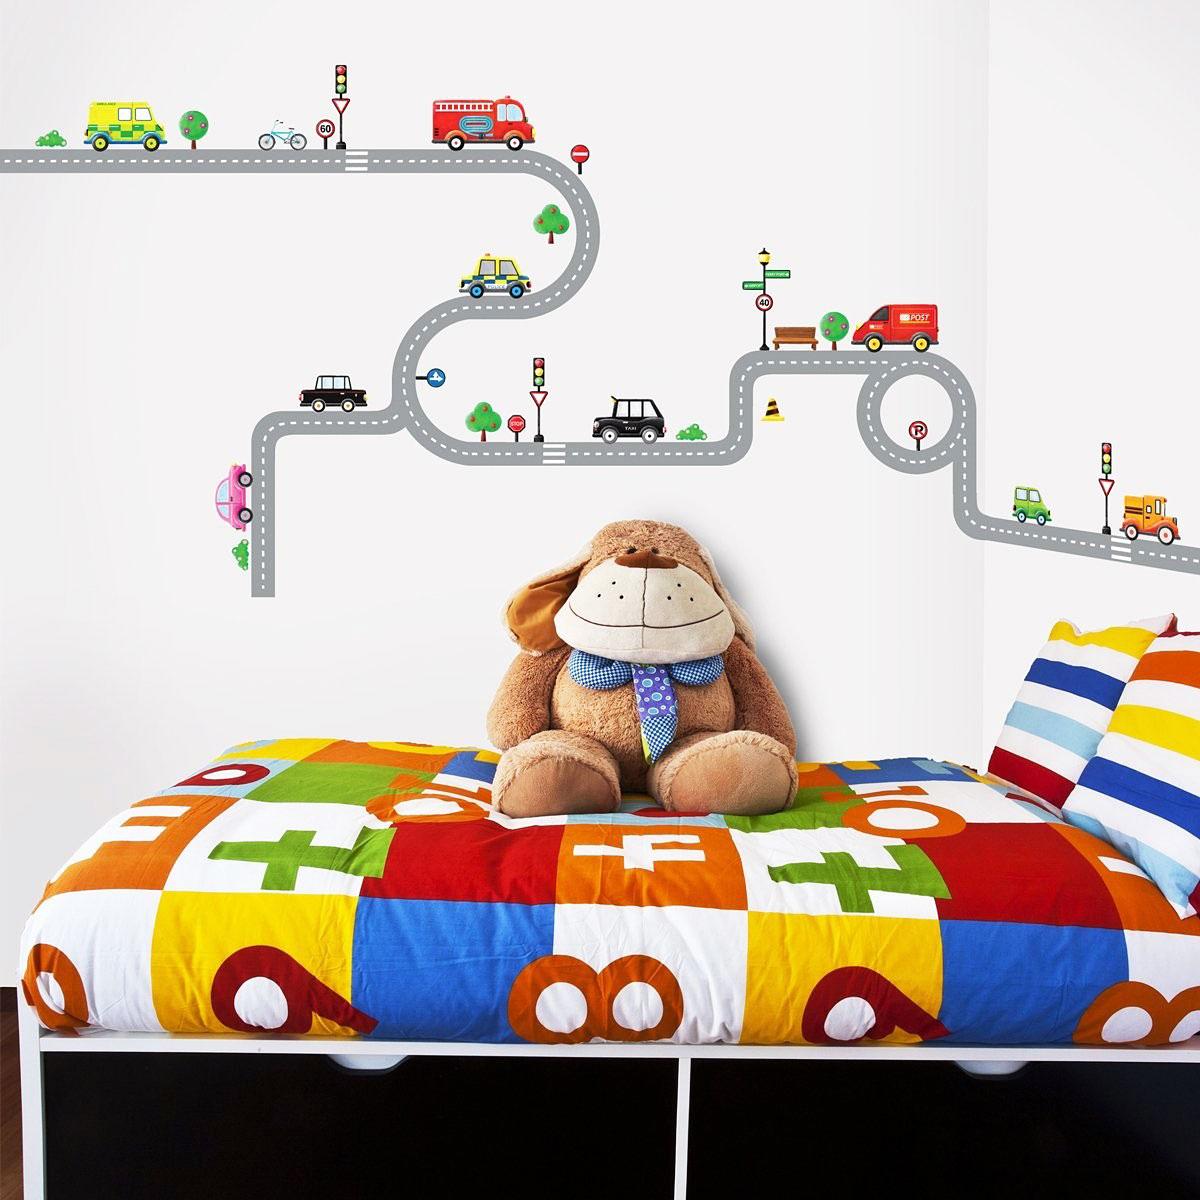 Kinderzimmer Tapeten Feuerwehr : Wanddekoration Wandsticker Wandpuzzle Wandaufkleber Autobahn Stra?en